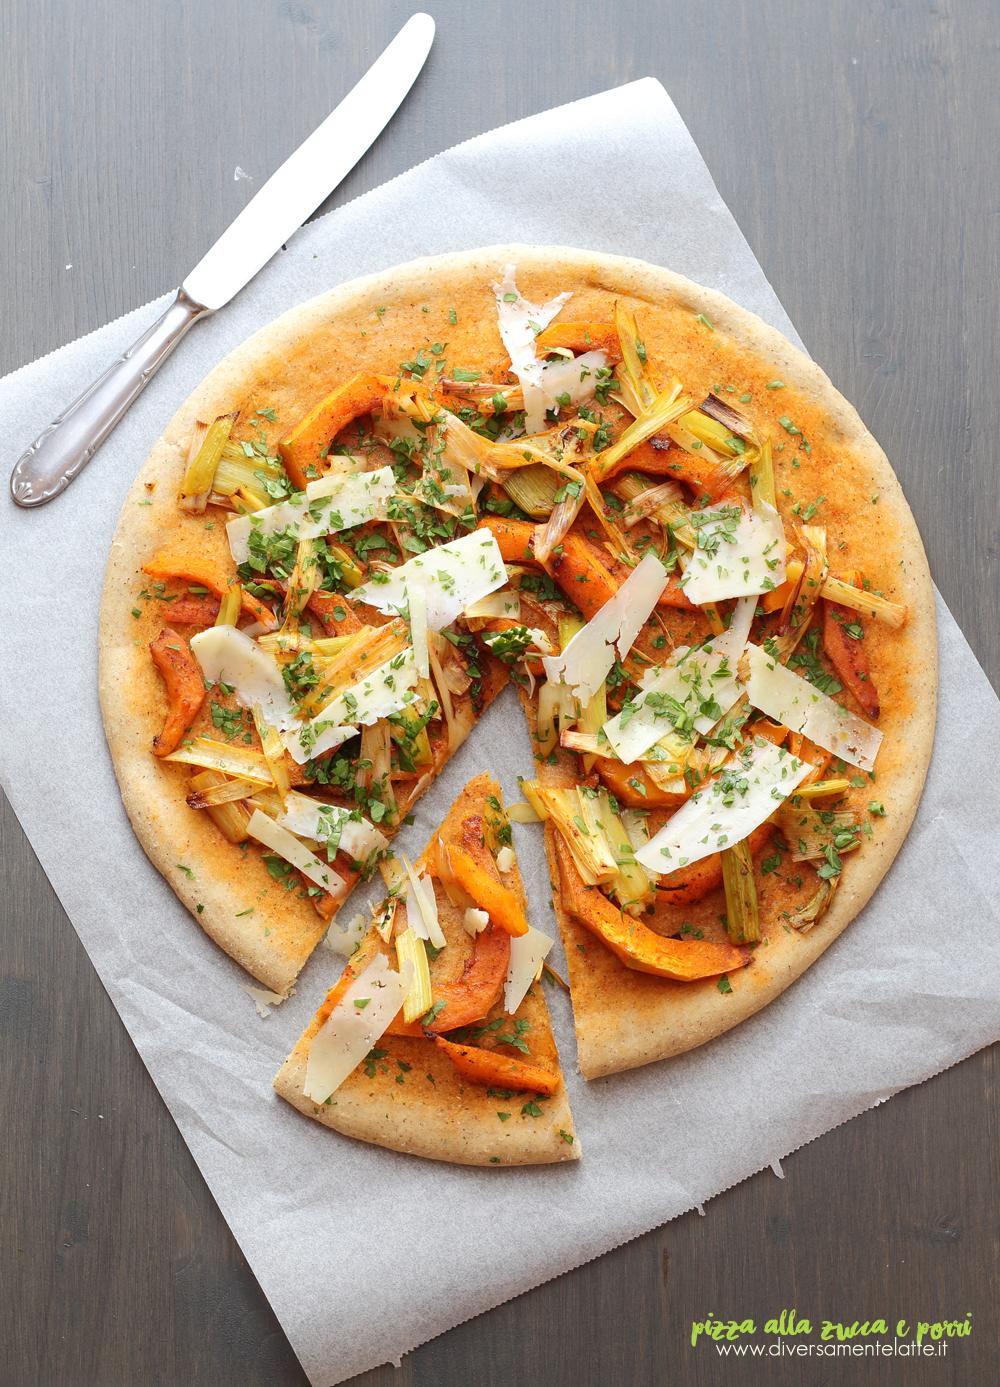 pizza alla zucca e porri vegetariana